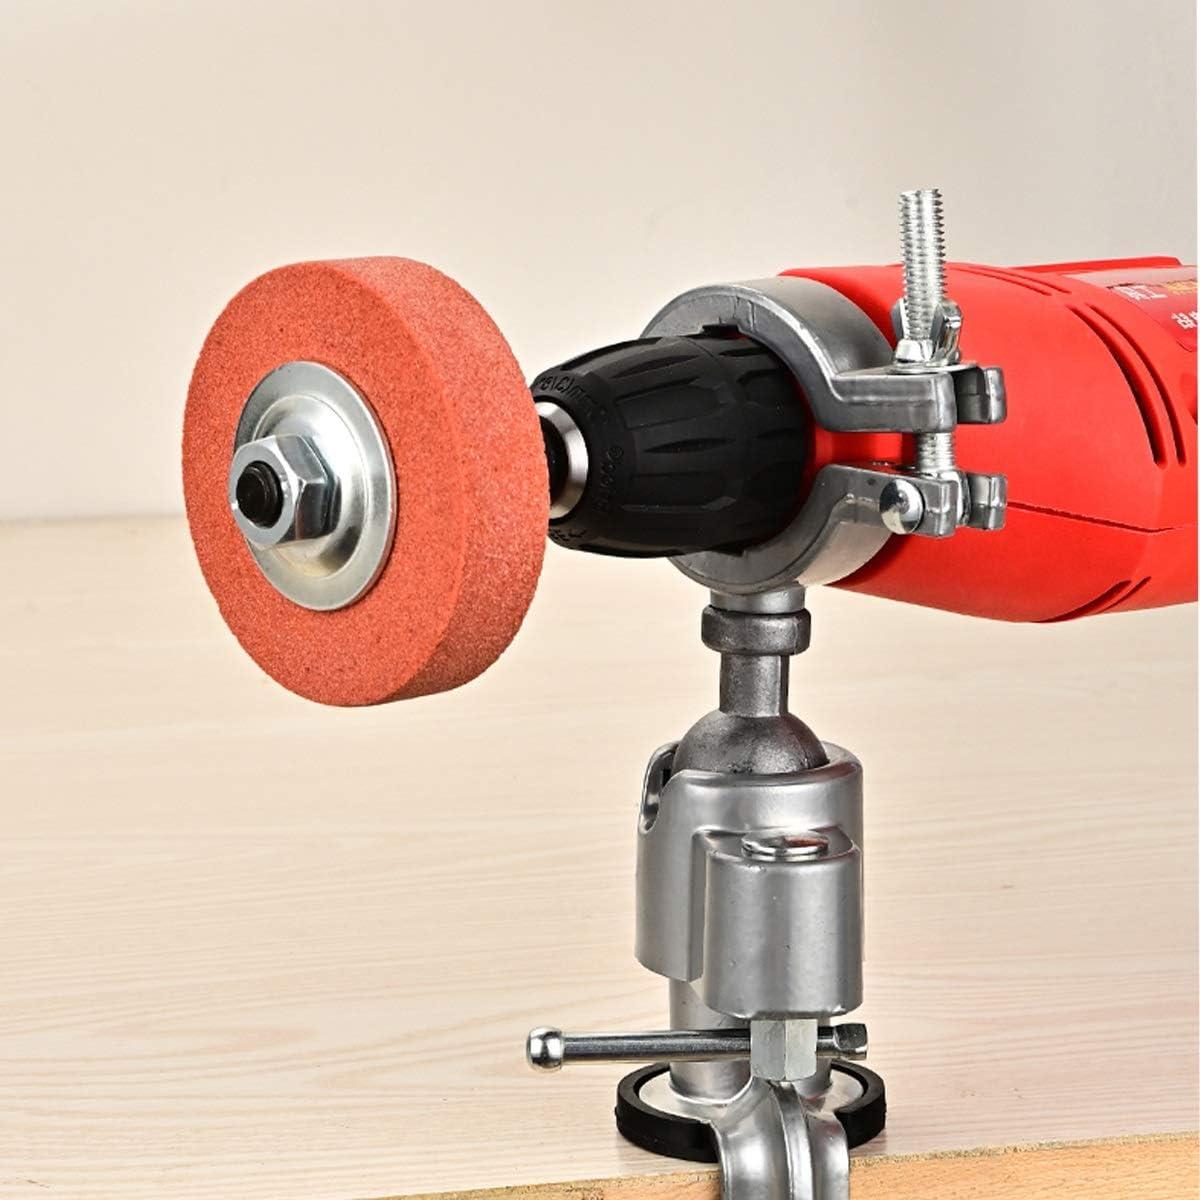 uxcell 12 Pcs Power Drill Polishing Part 8mm Dia Cone Felt Bobs 3mm Shank